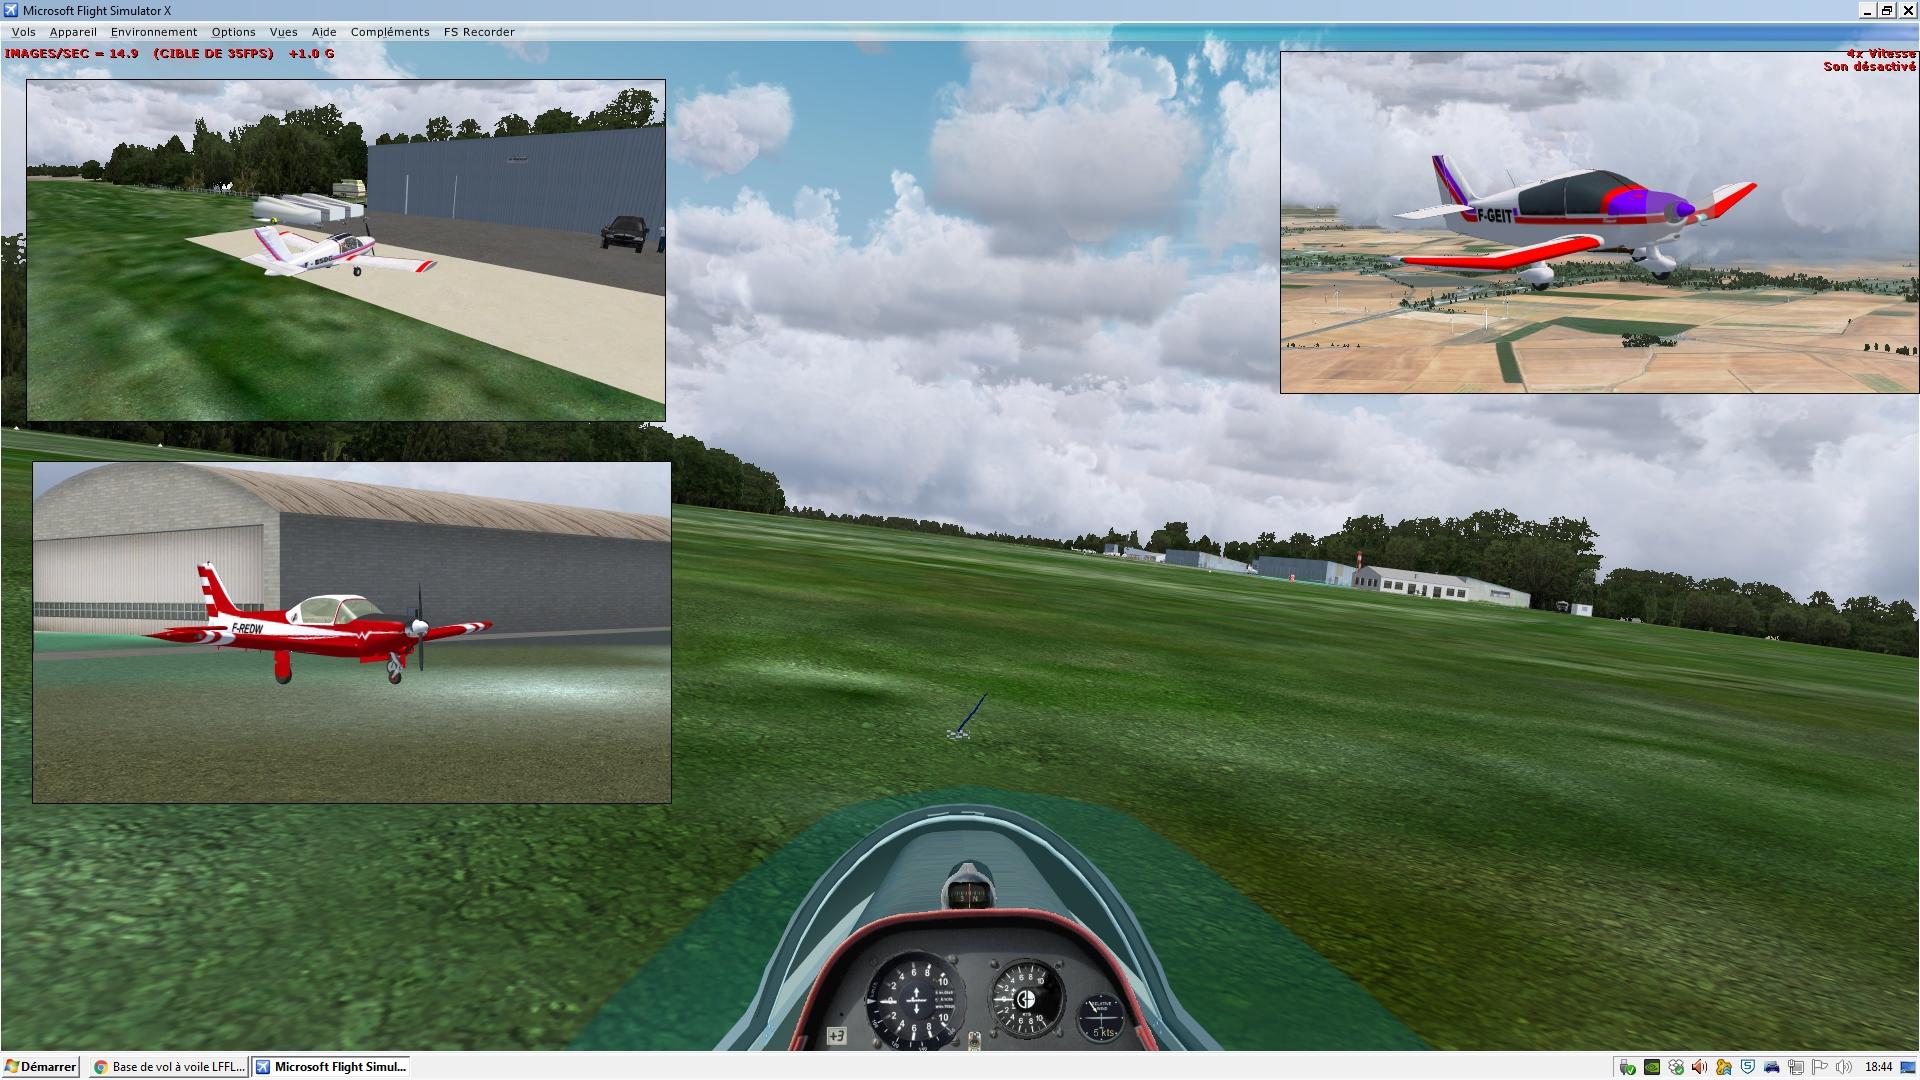 http://www.pilote-virtuel.com/img/gallery/1485712186.jpg